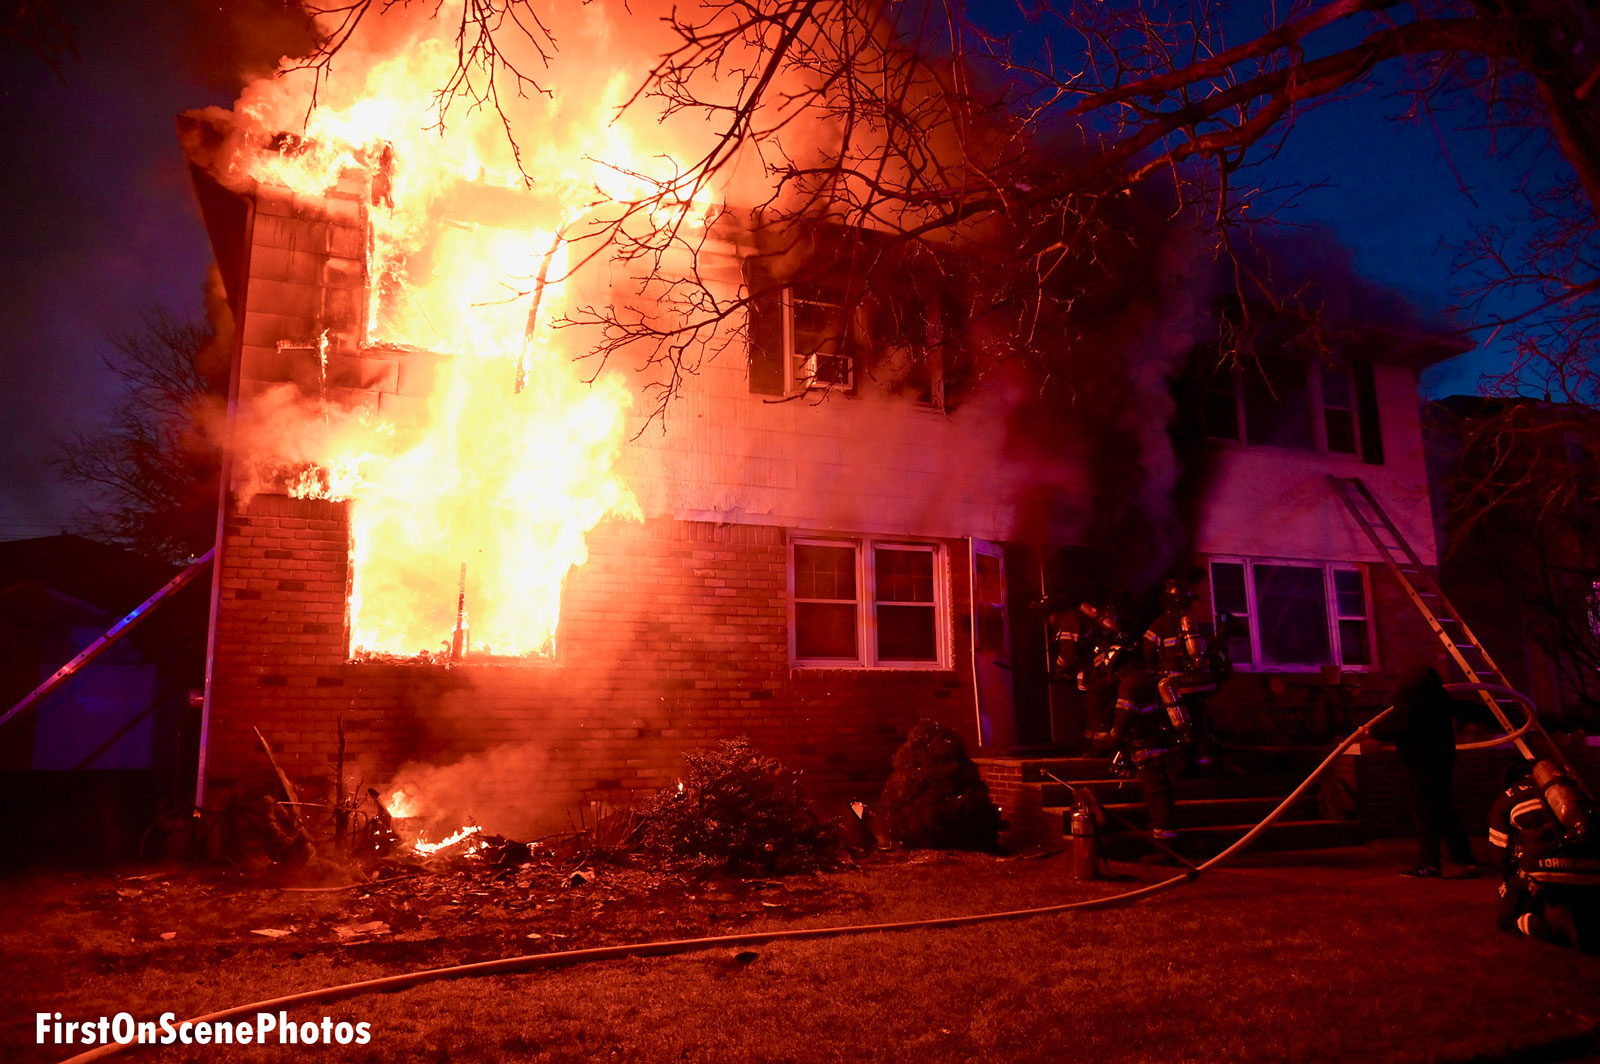 Crews encountered heavy fire on multiple floors